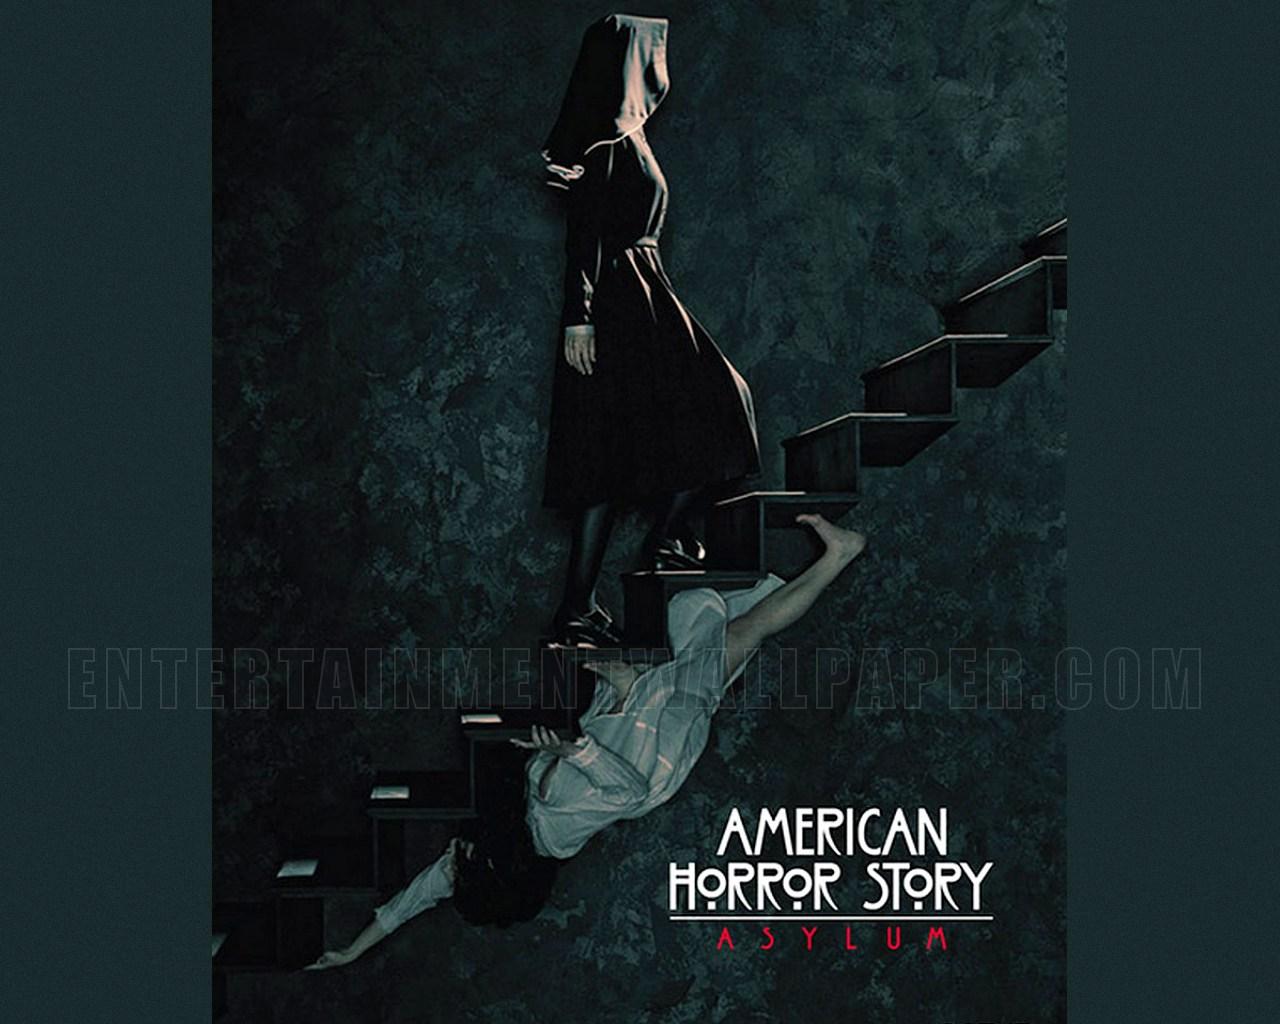 American Horror Story Hd Wallpaper: American Horror Story HD Wallpaper